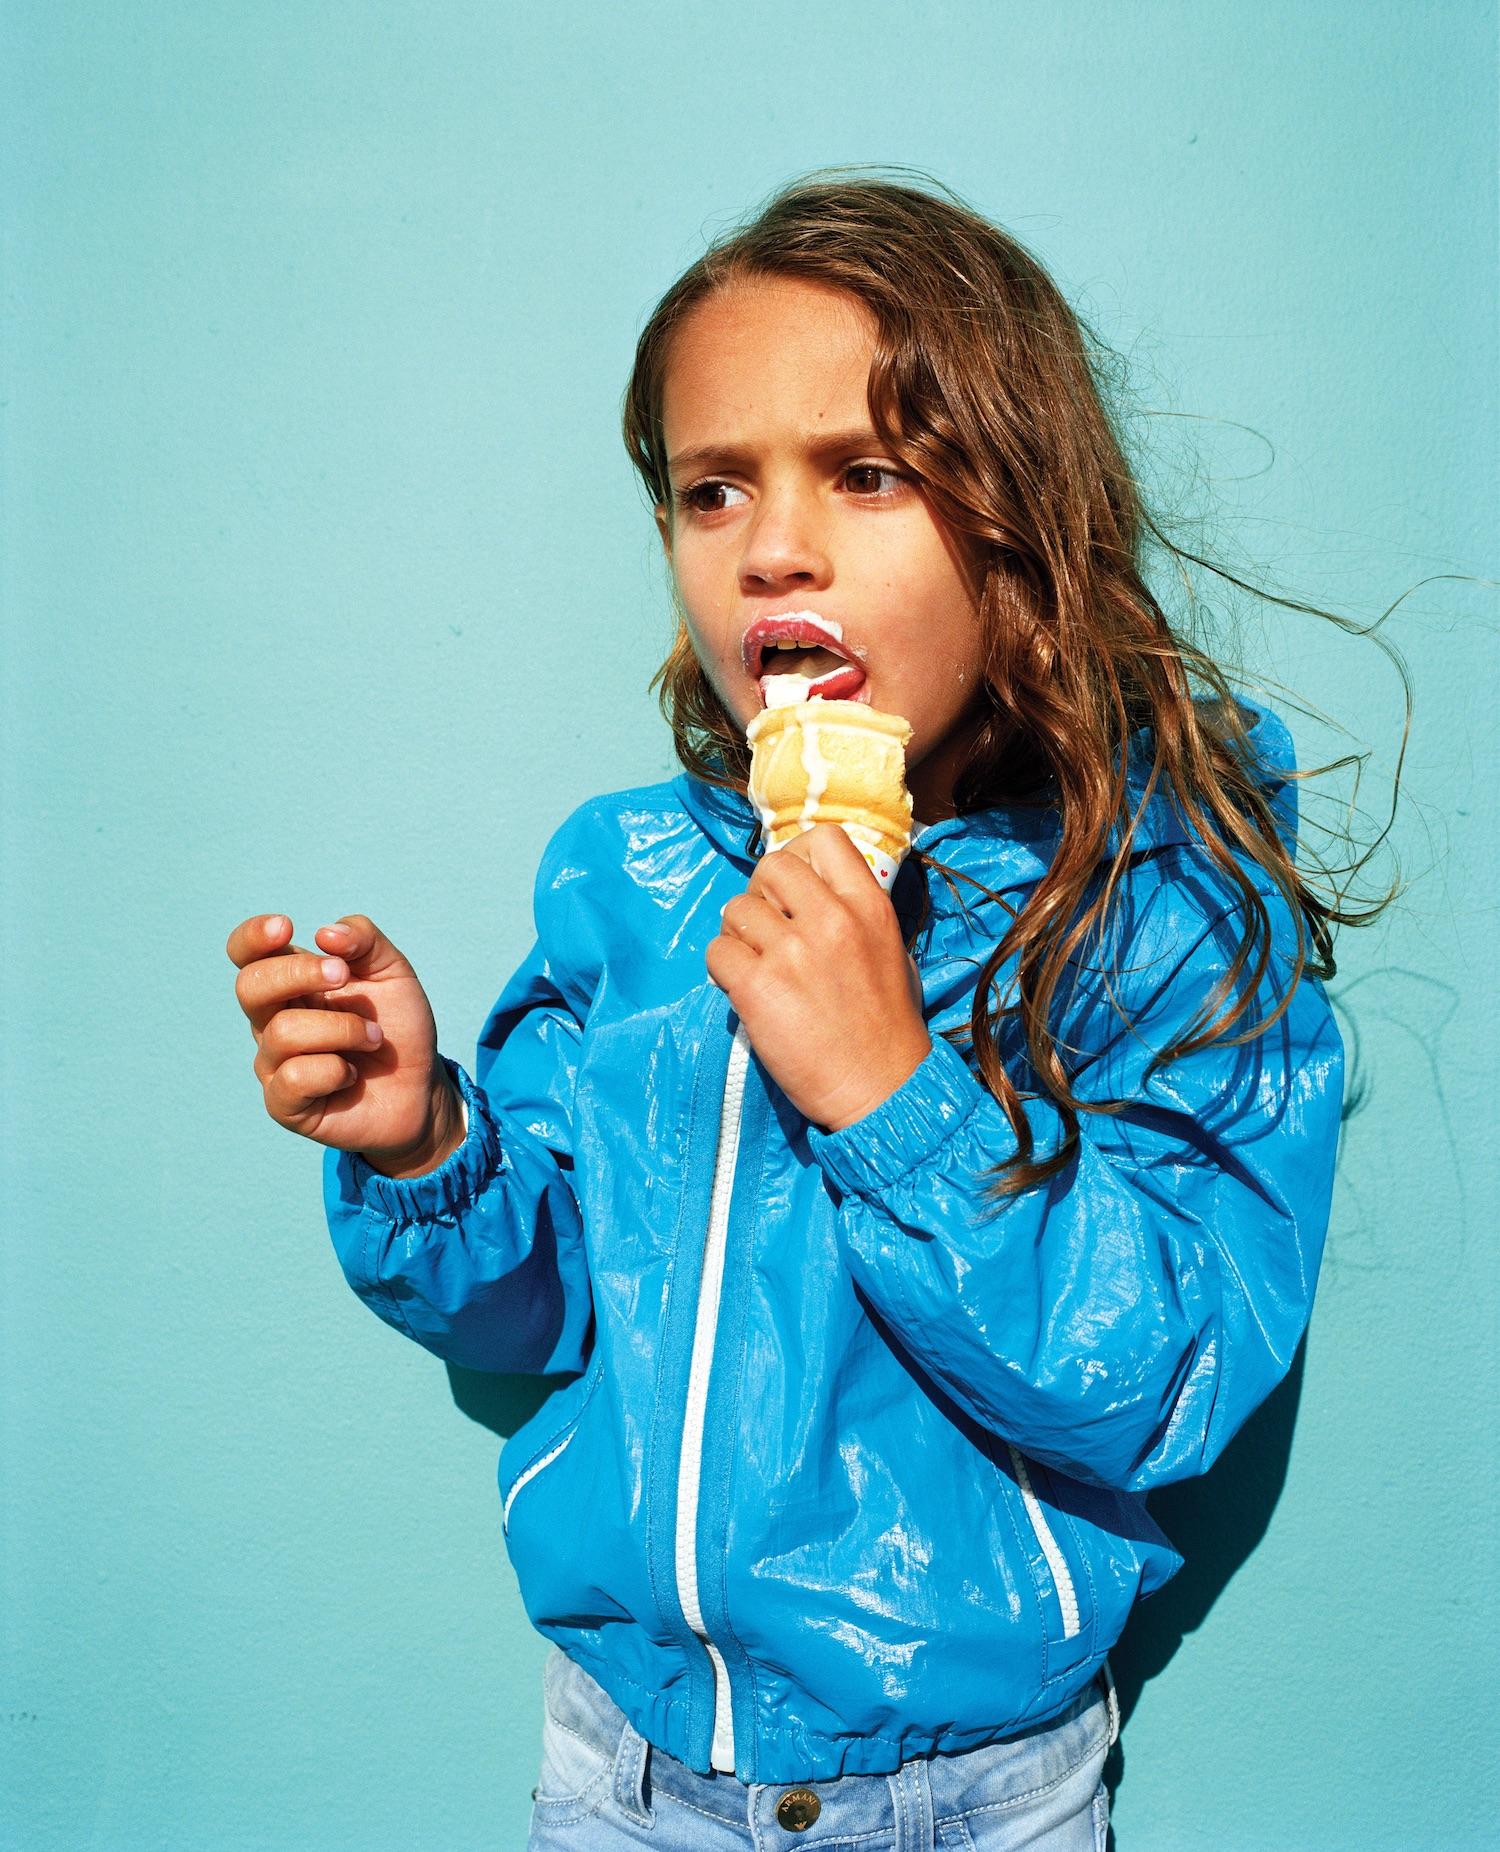 Ed Templeton, Evan Cassidy Eats Ice Cream, 2017